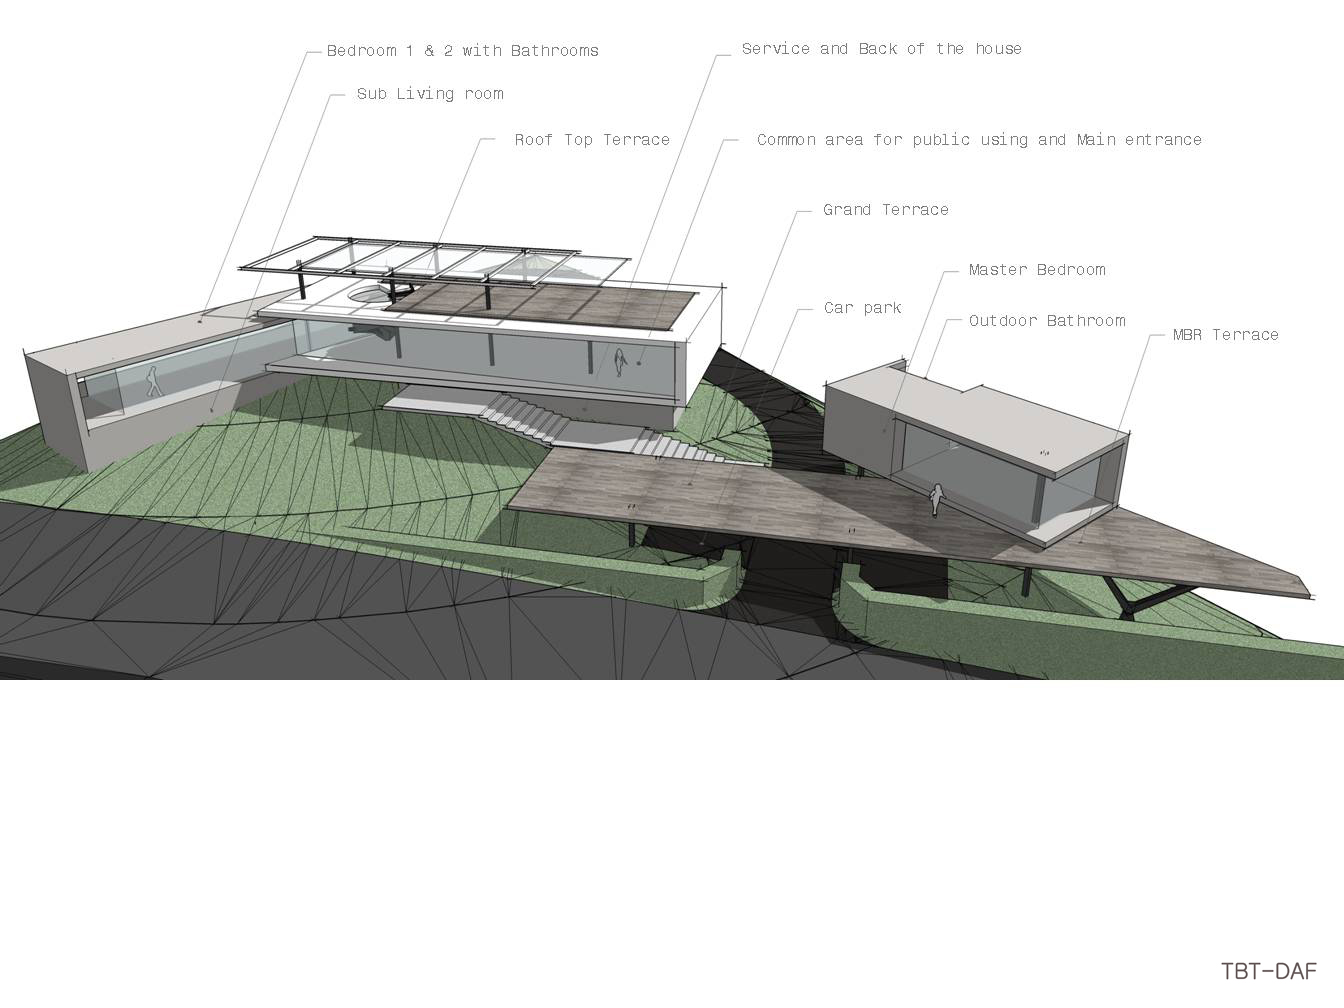 TBT-DAF interior design house khoyai thailand phupattra 6